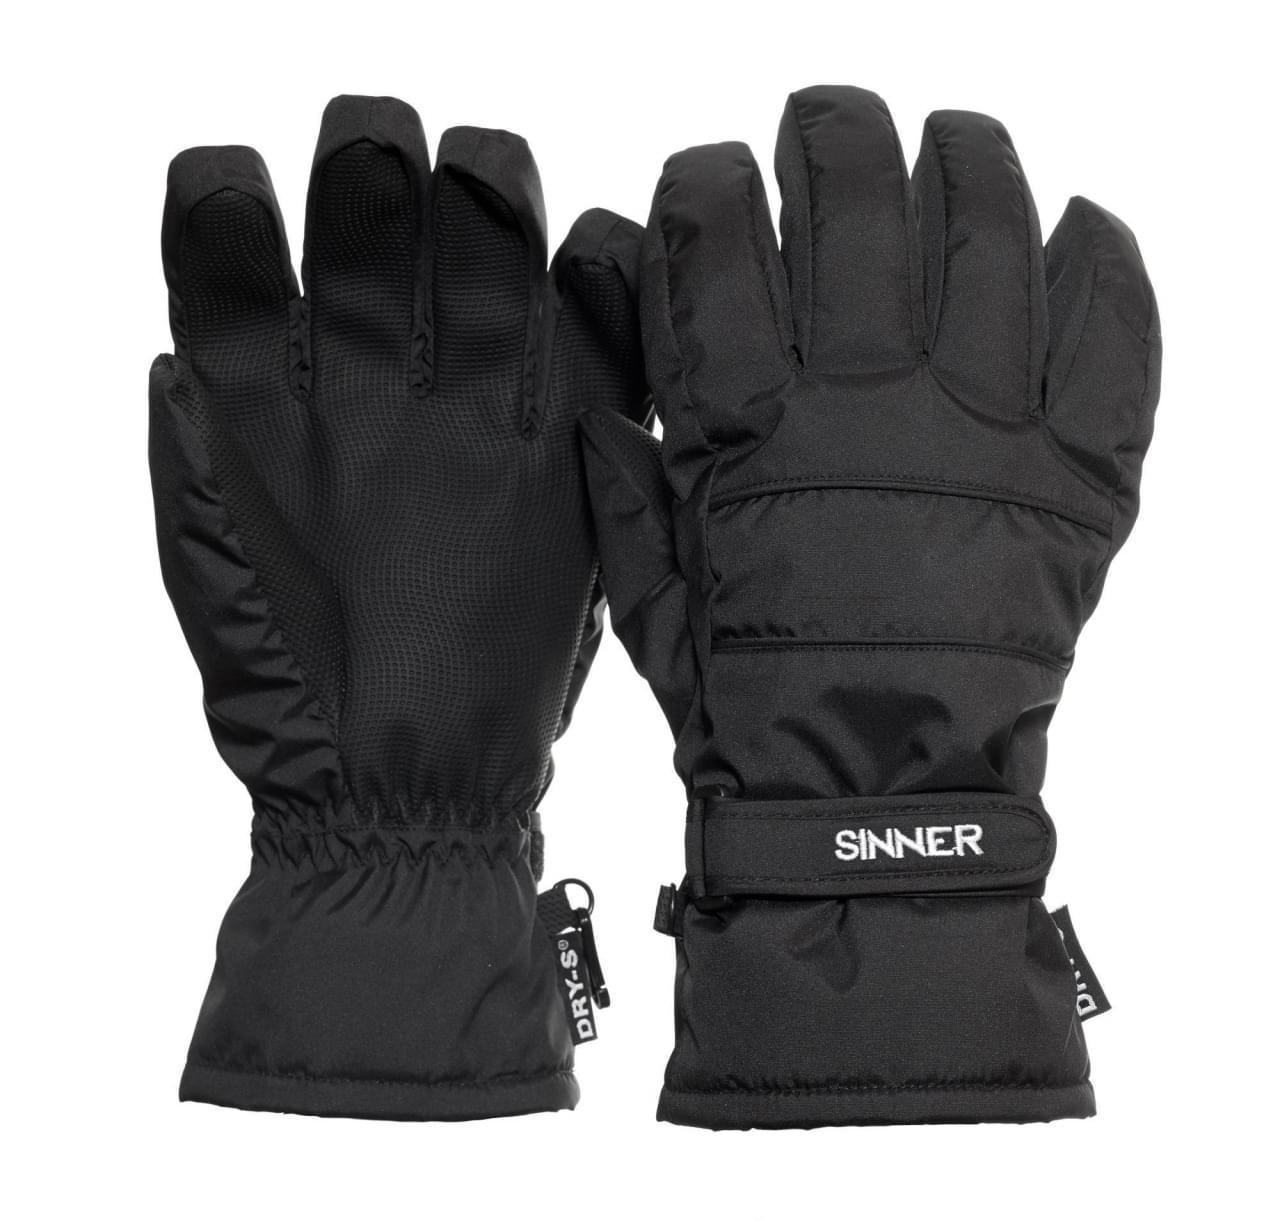 Sinner Vertana Handschoenen